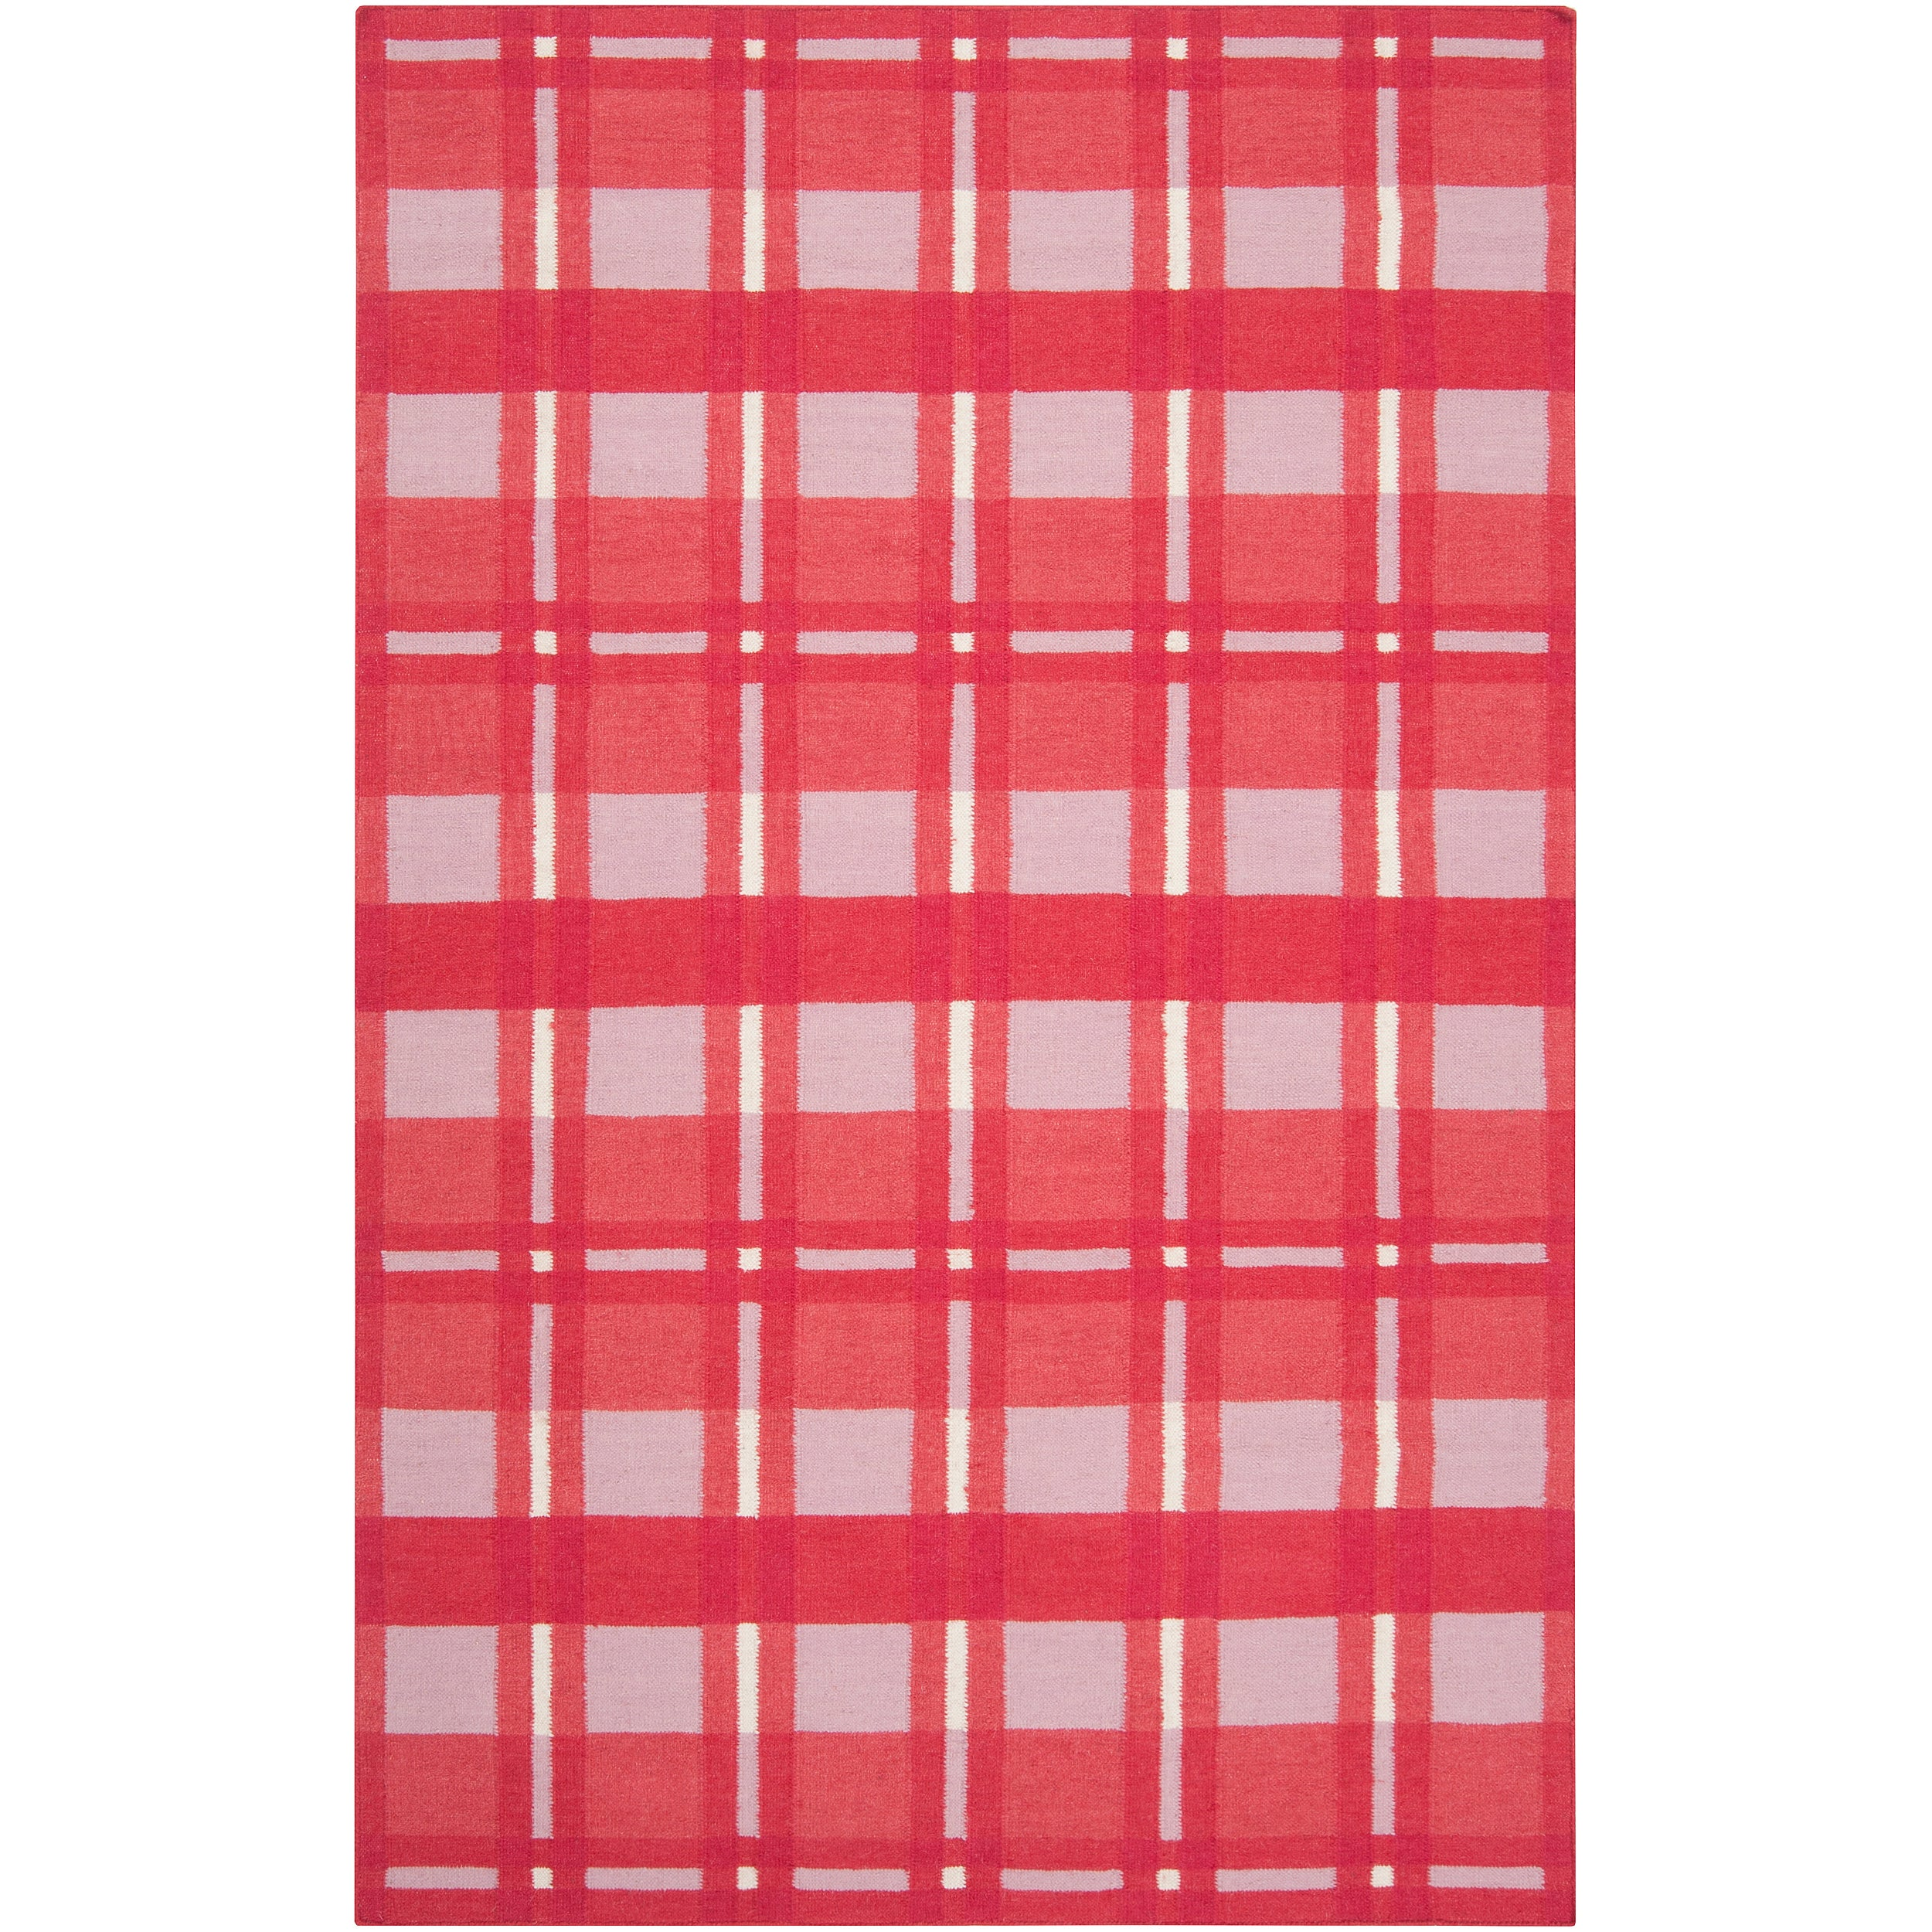 SURYA Hand-woven Pink Hapac Wool Rug (8' x 11'), Size 8' ...